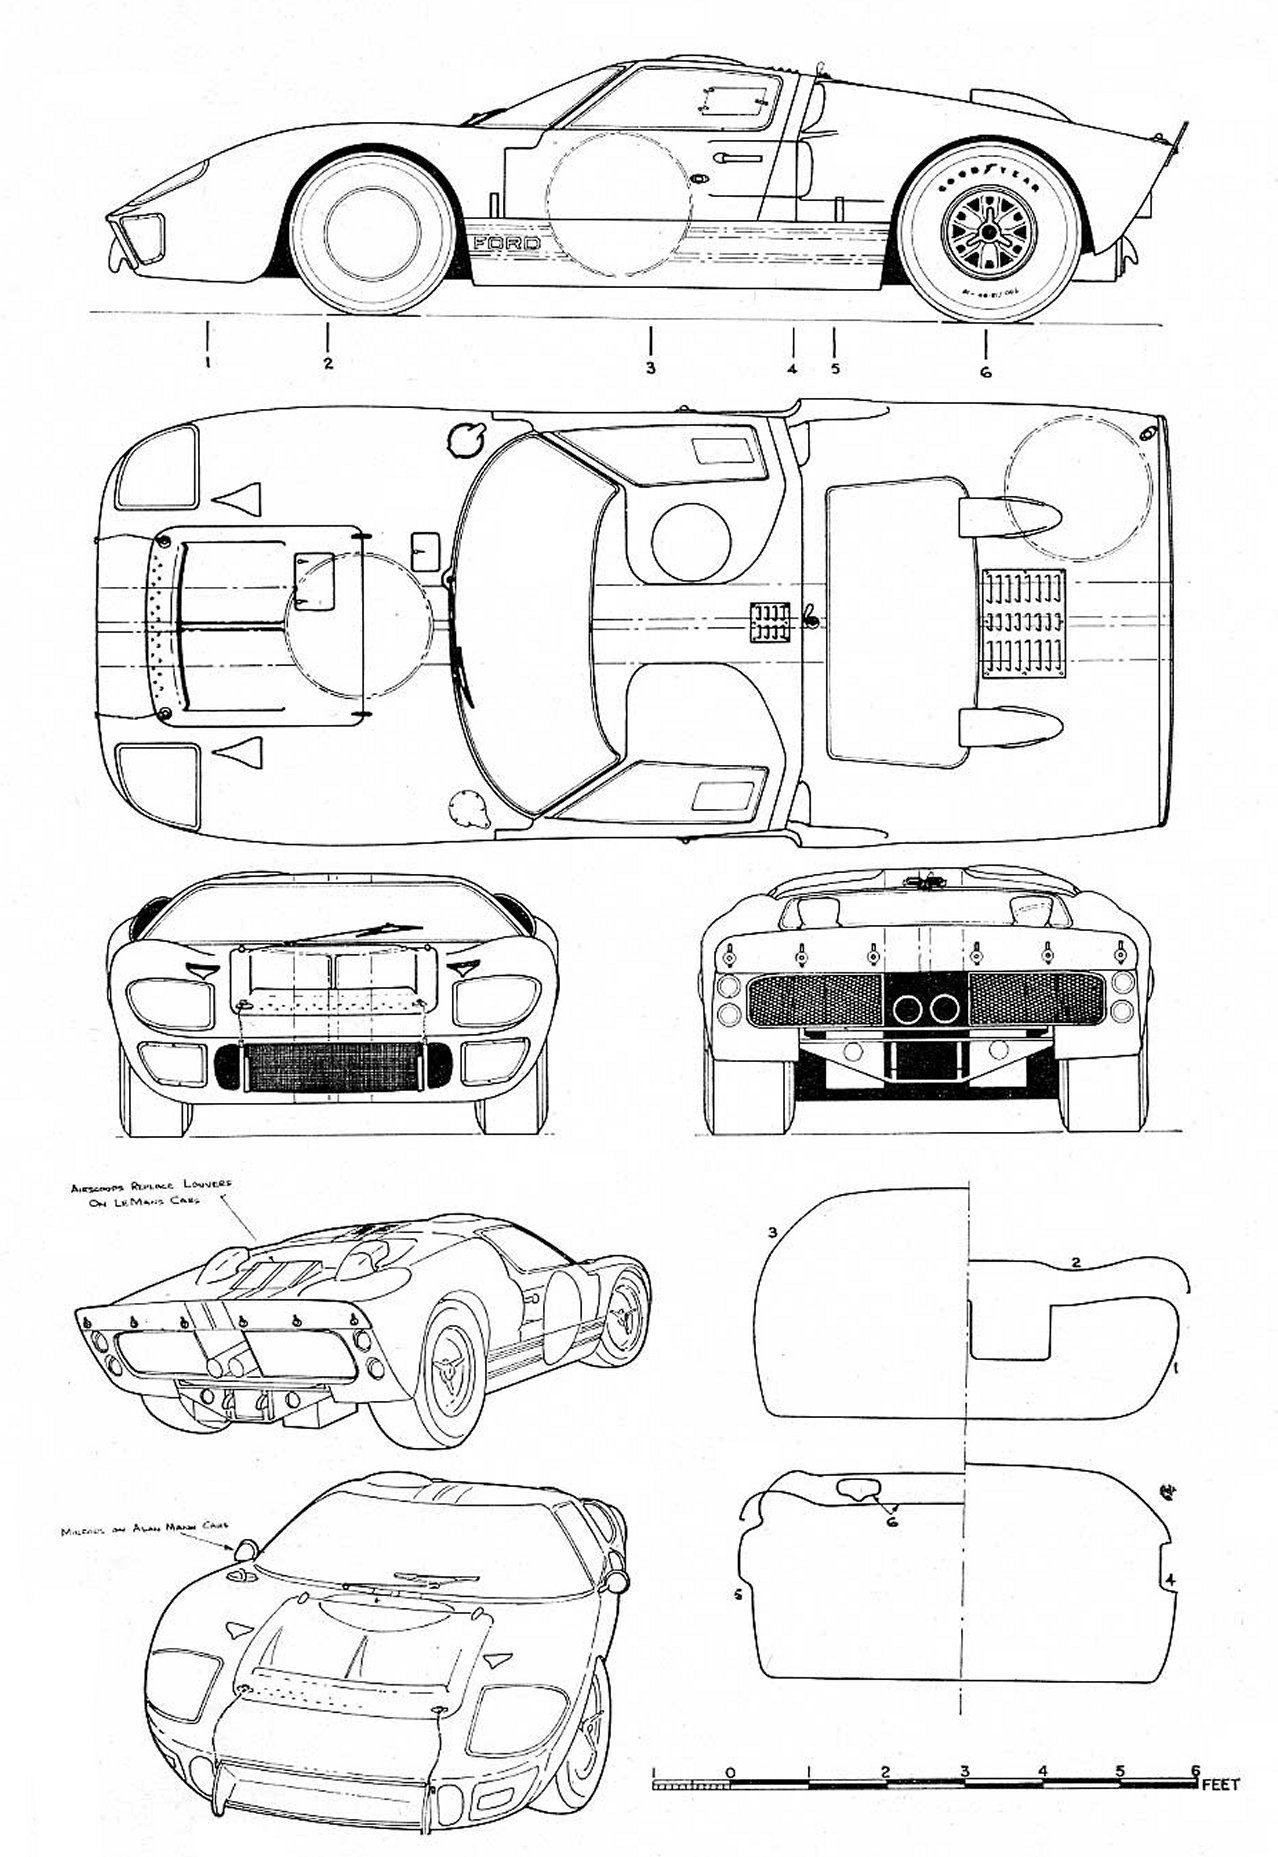 Tutoriales3d Blueprints Ford Gt40 Mk Ii